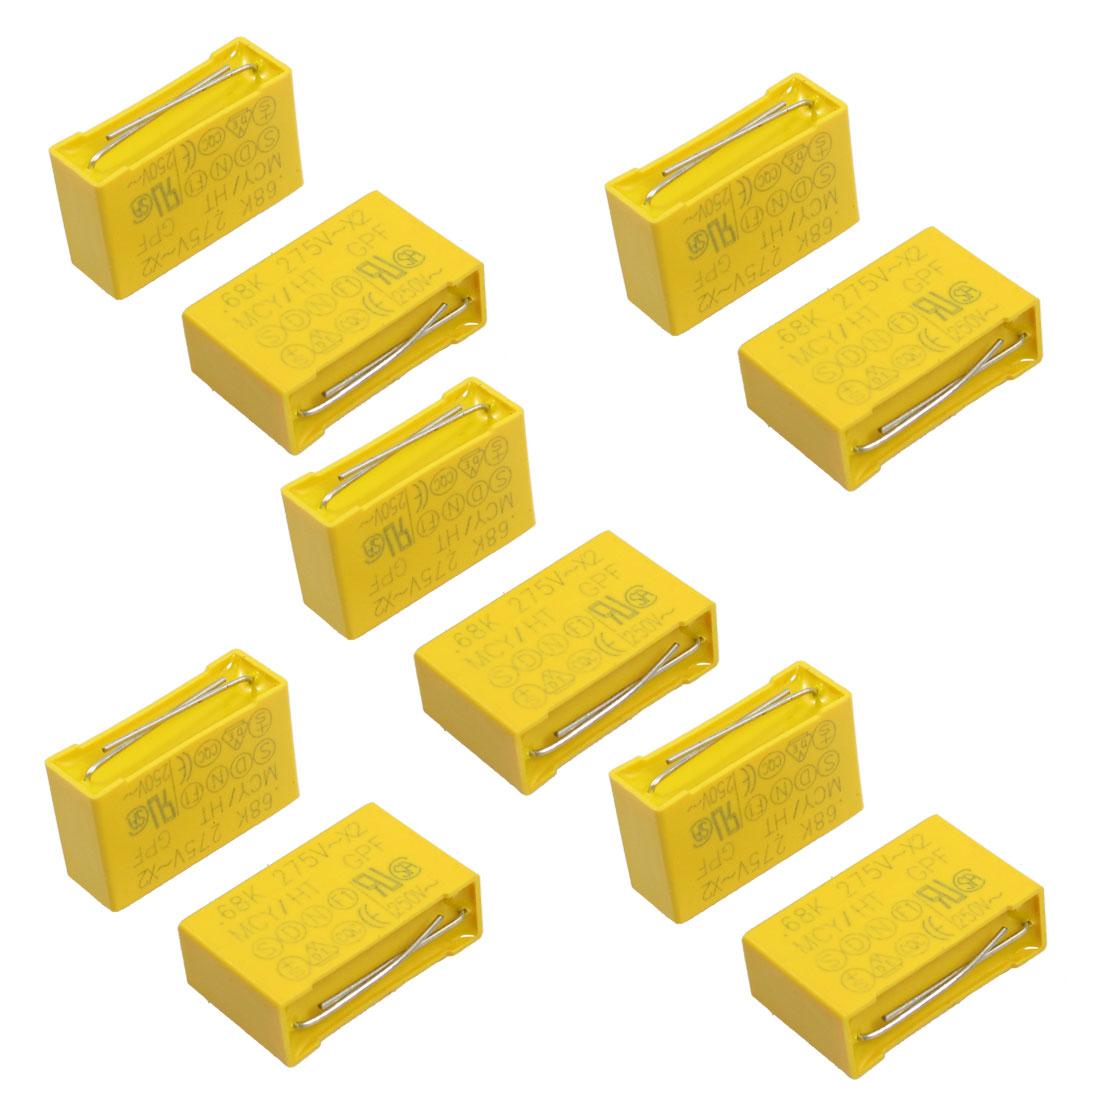 10 Pcs AC 275V 0.68uF X2 Series Polypropylene Film Safety Capacitors